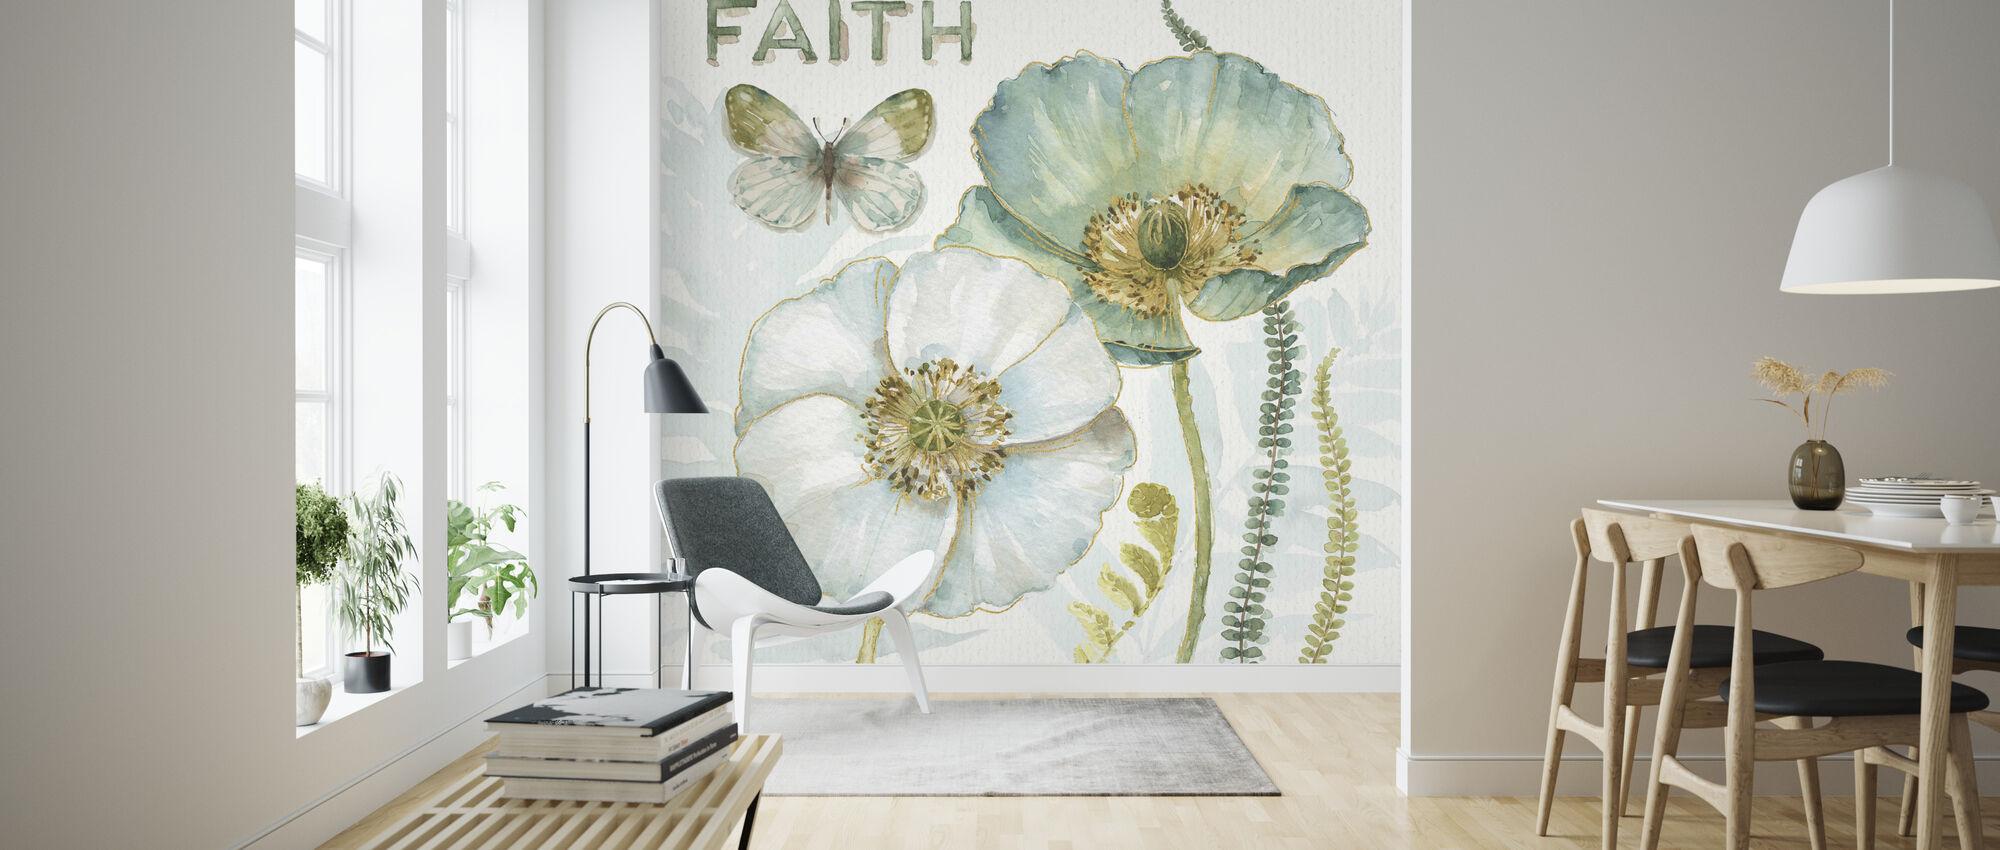 Mine drivhus Blomster - Tro - Tapet - Stue